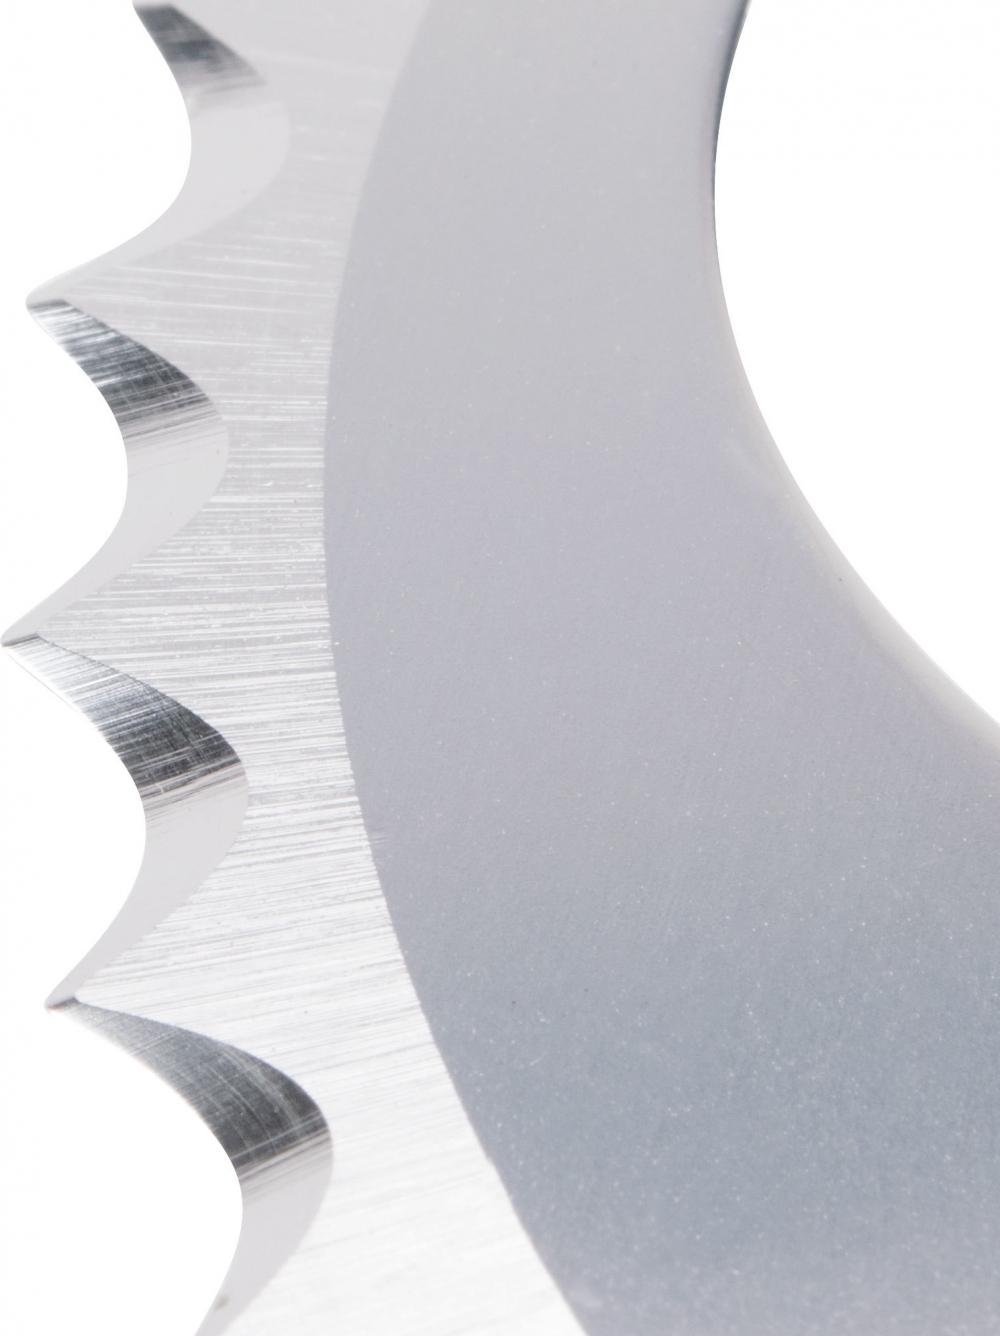 Зубчатый нож Robot Coupe 27288 - 6